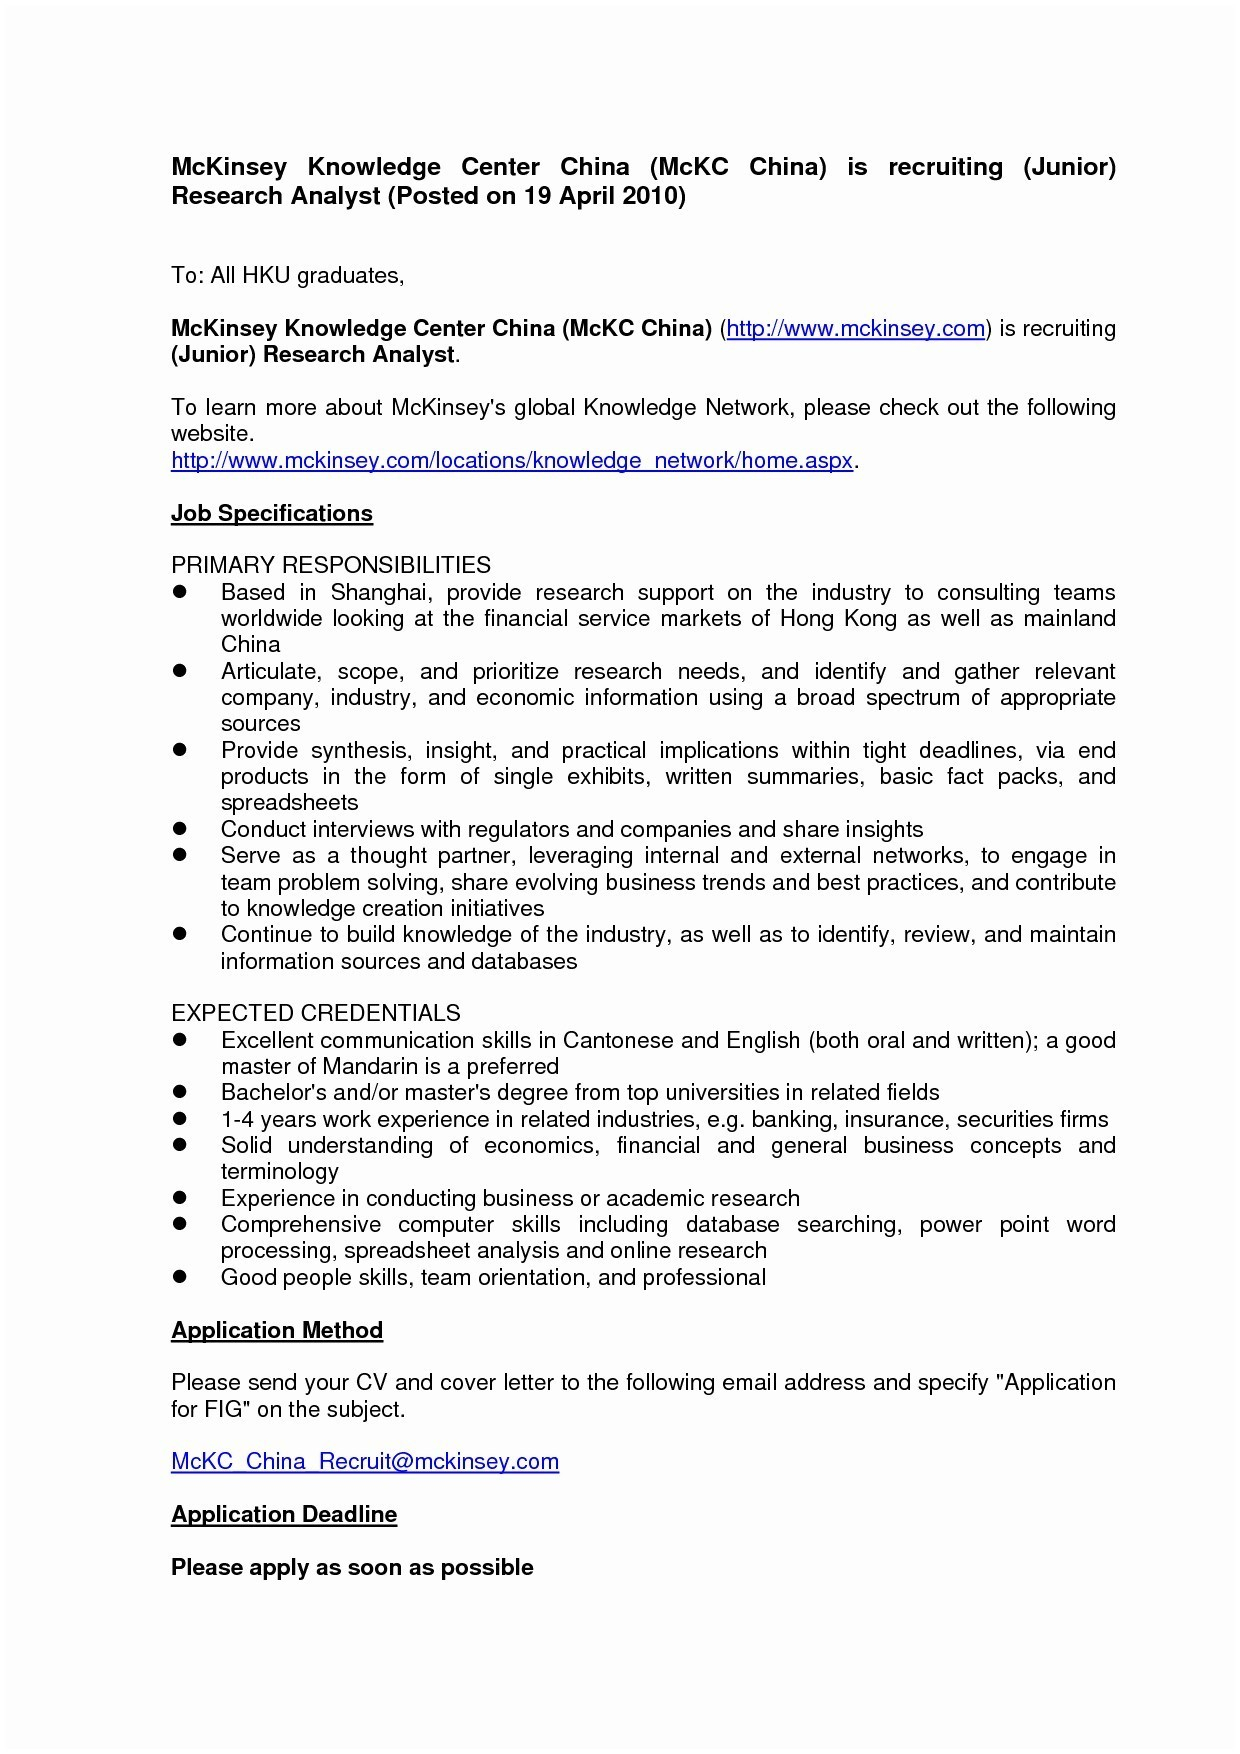 Sales Cover Letter Template - Cover Letter for Sales assistant Job Best New Job Fer Letter